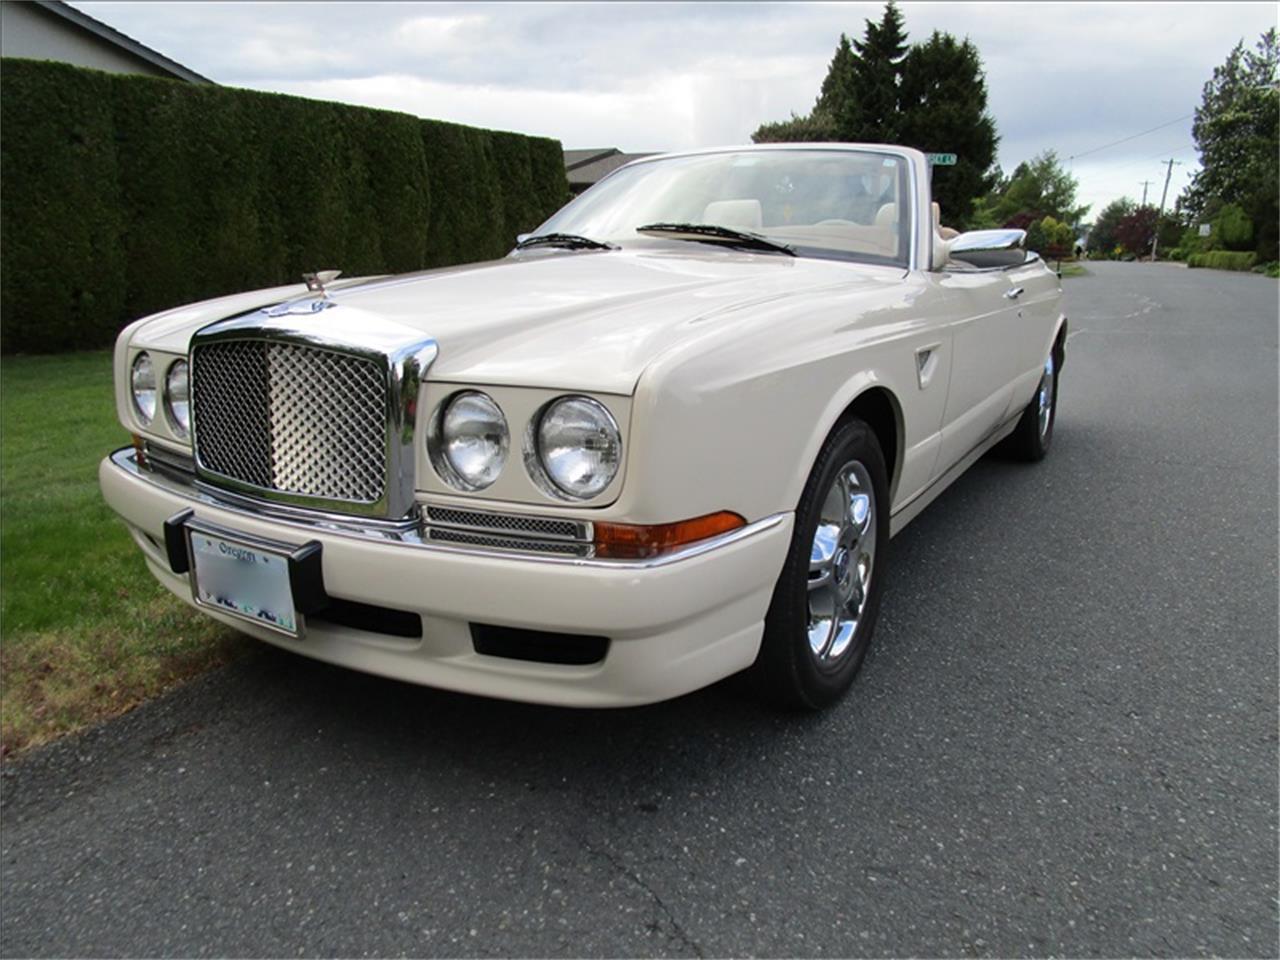 2001 Bentley Azure 2-Dr Tourer Mulliner Convertible (CC-1346117) for sale in Kenmore, Washington